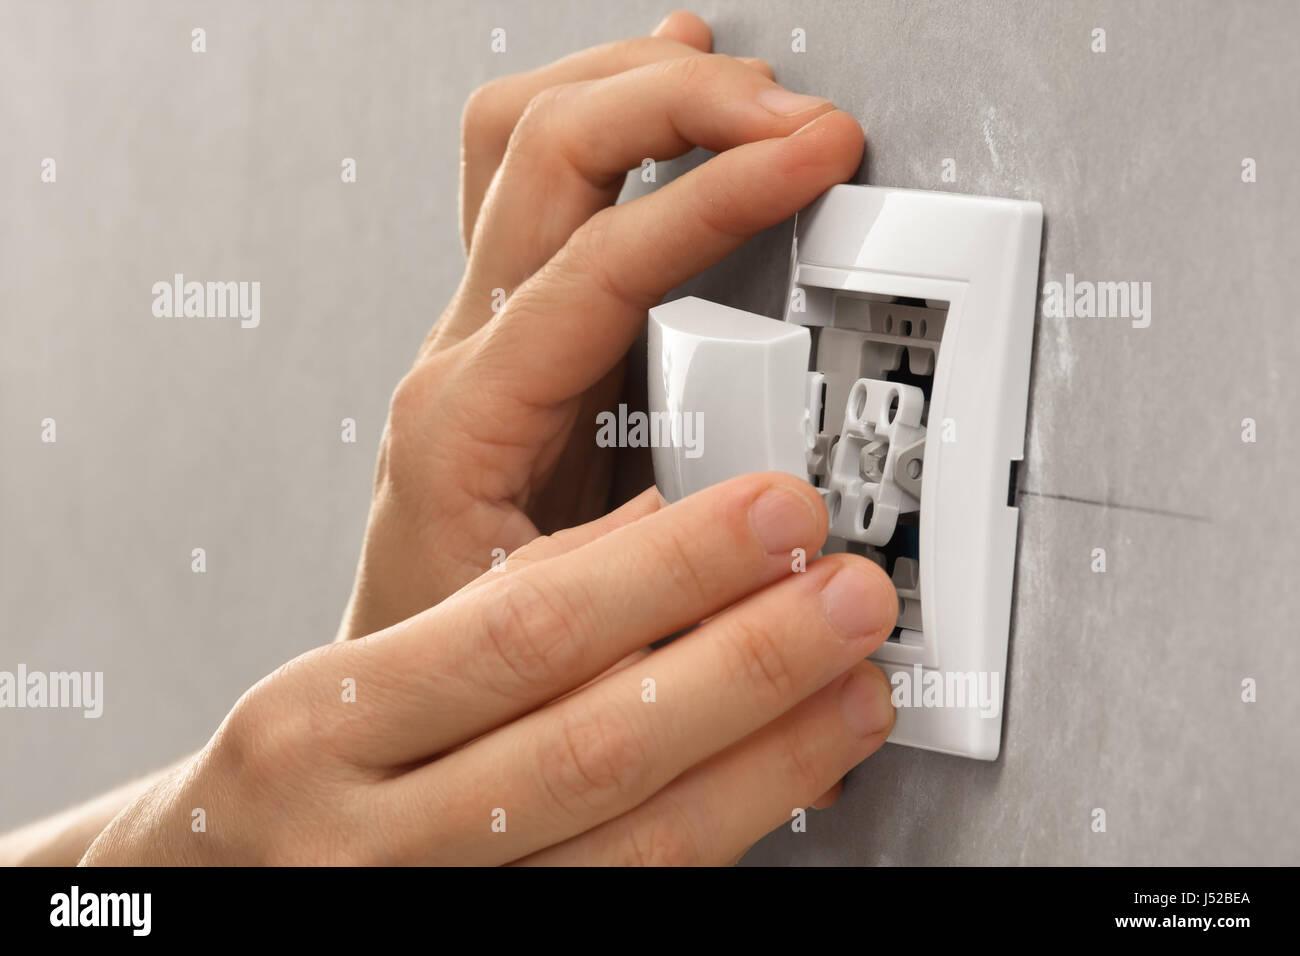 Hand Light Switch Stockfotos & Hand Light Switch Bilder - Alamy